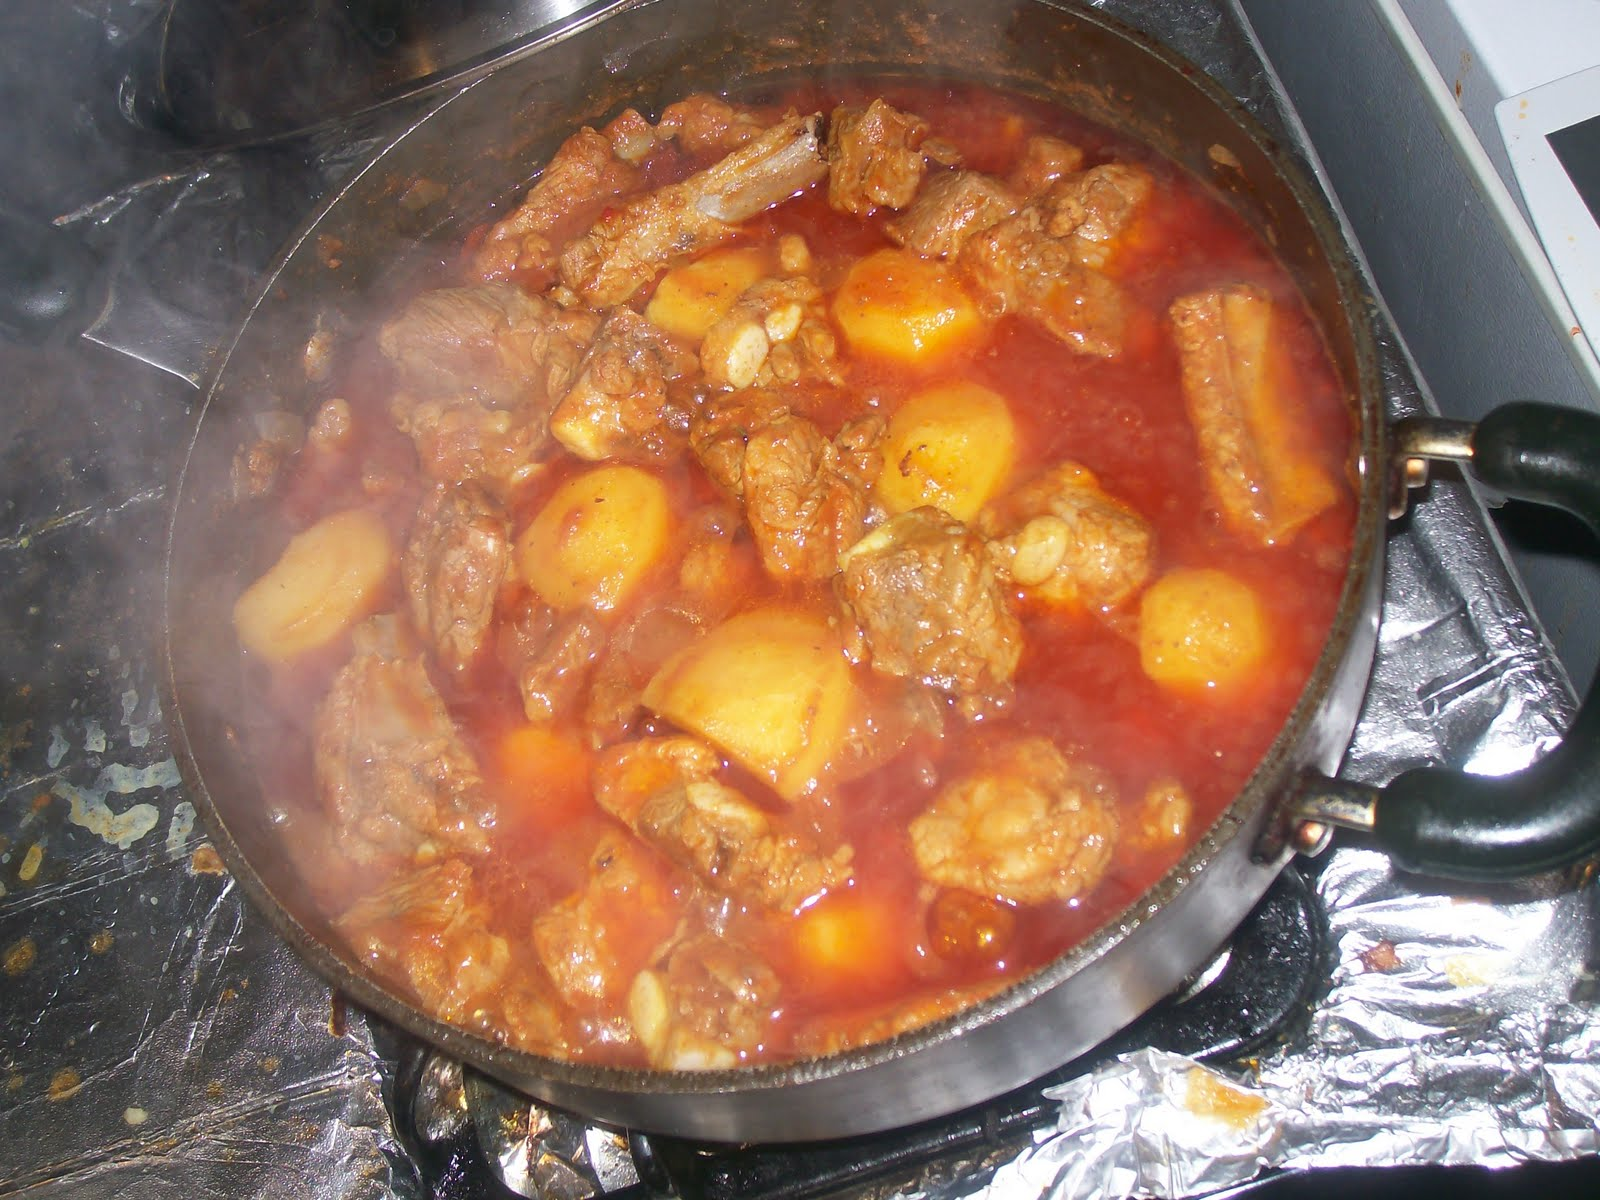 La cocina de nathan cuban spanish mexican cooking - Guiso de carne de cerdo ...